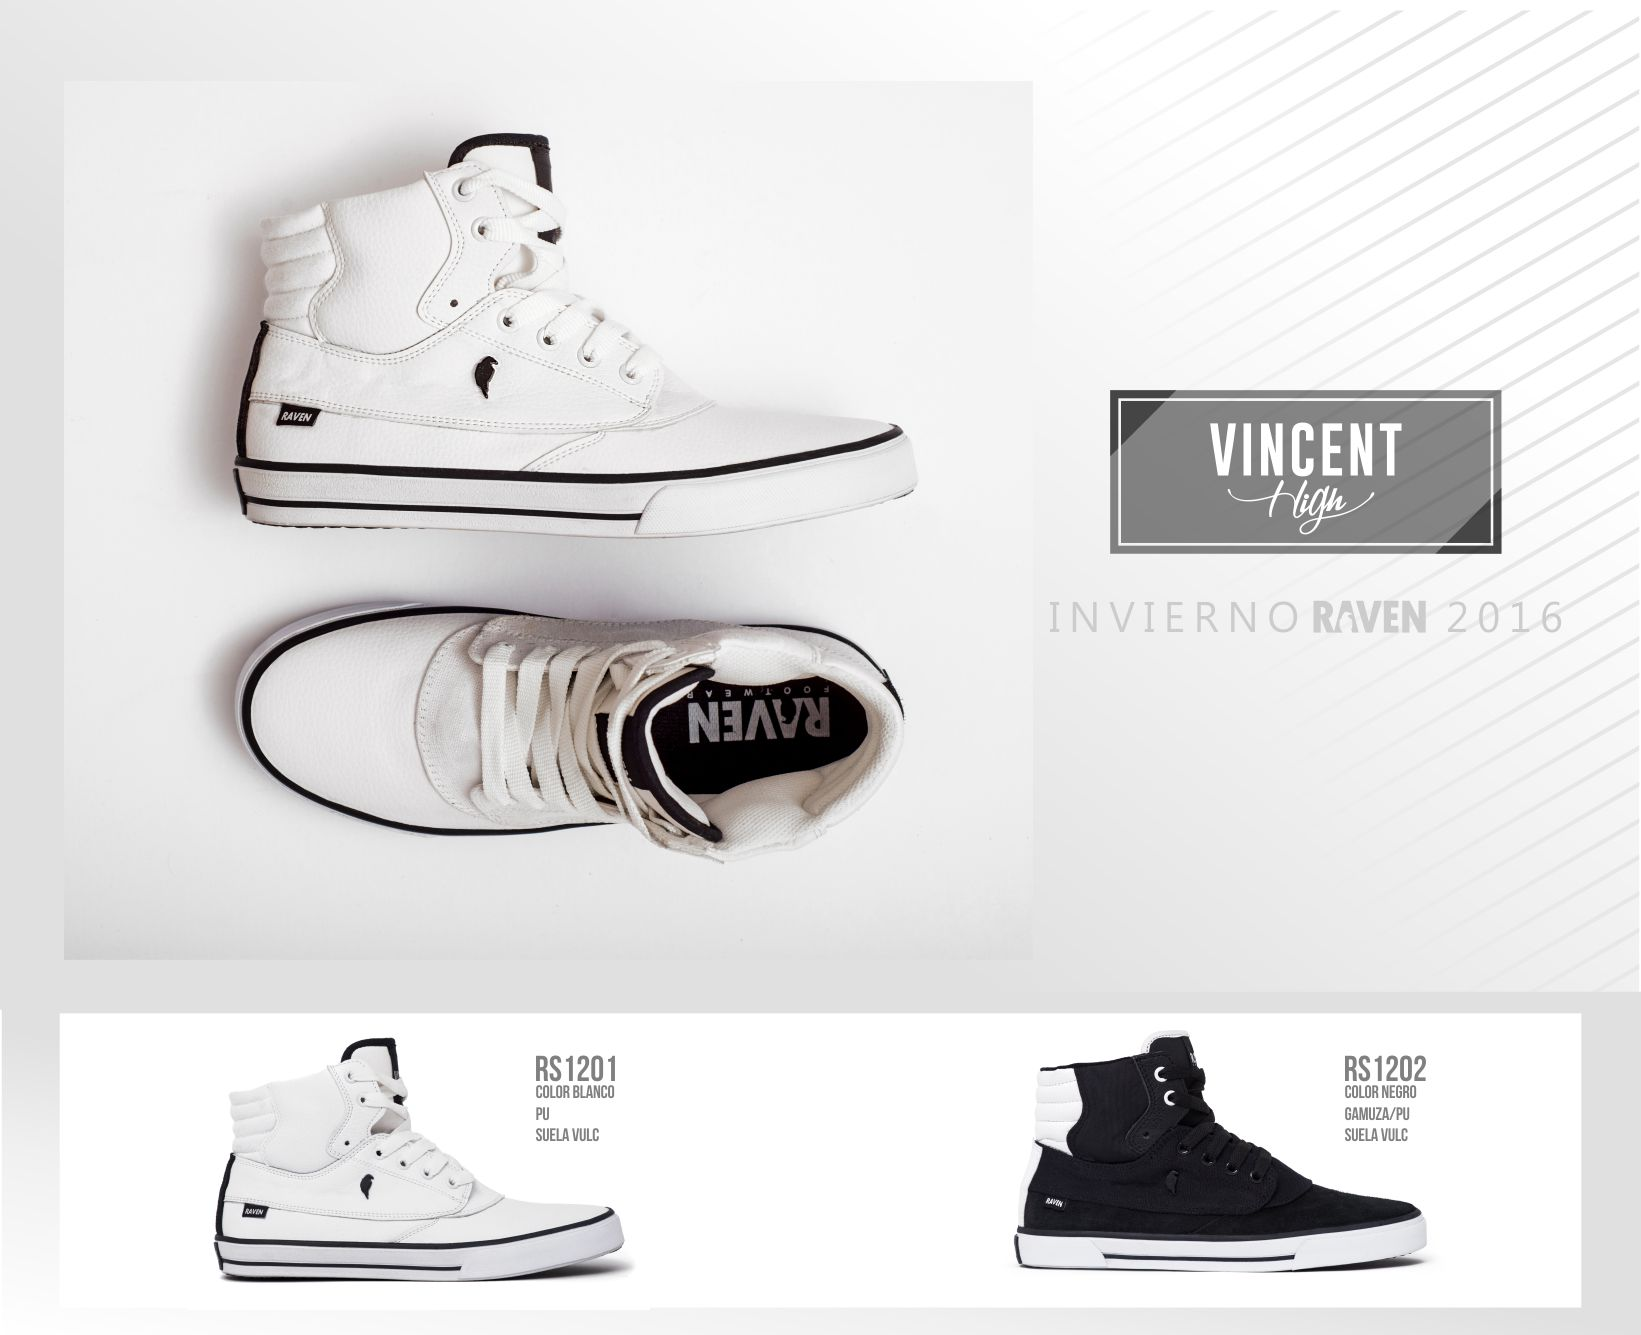 13-Vincent High